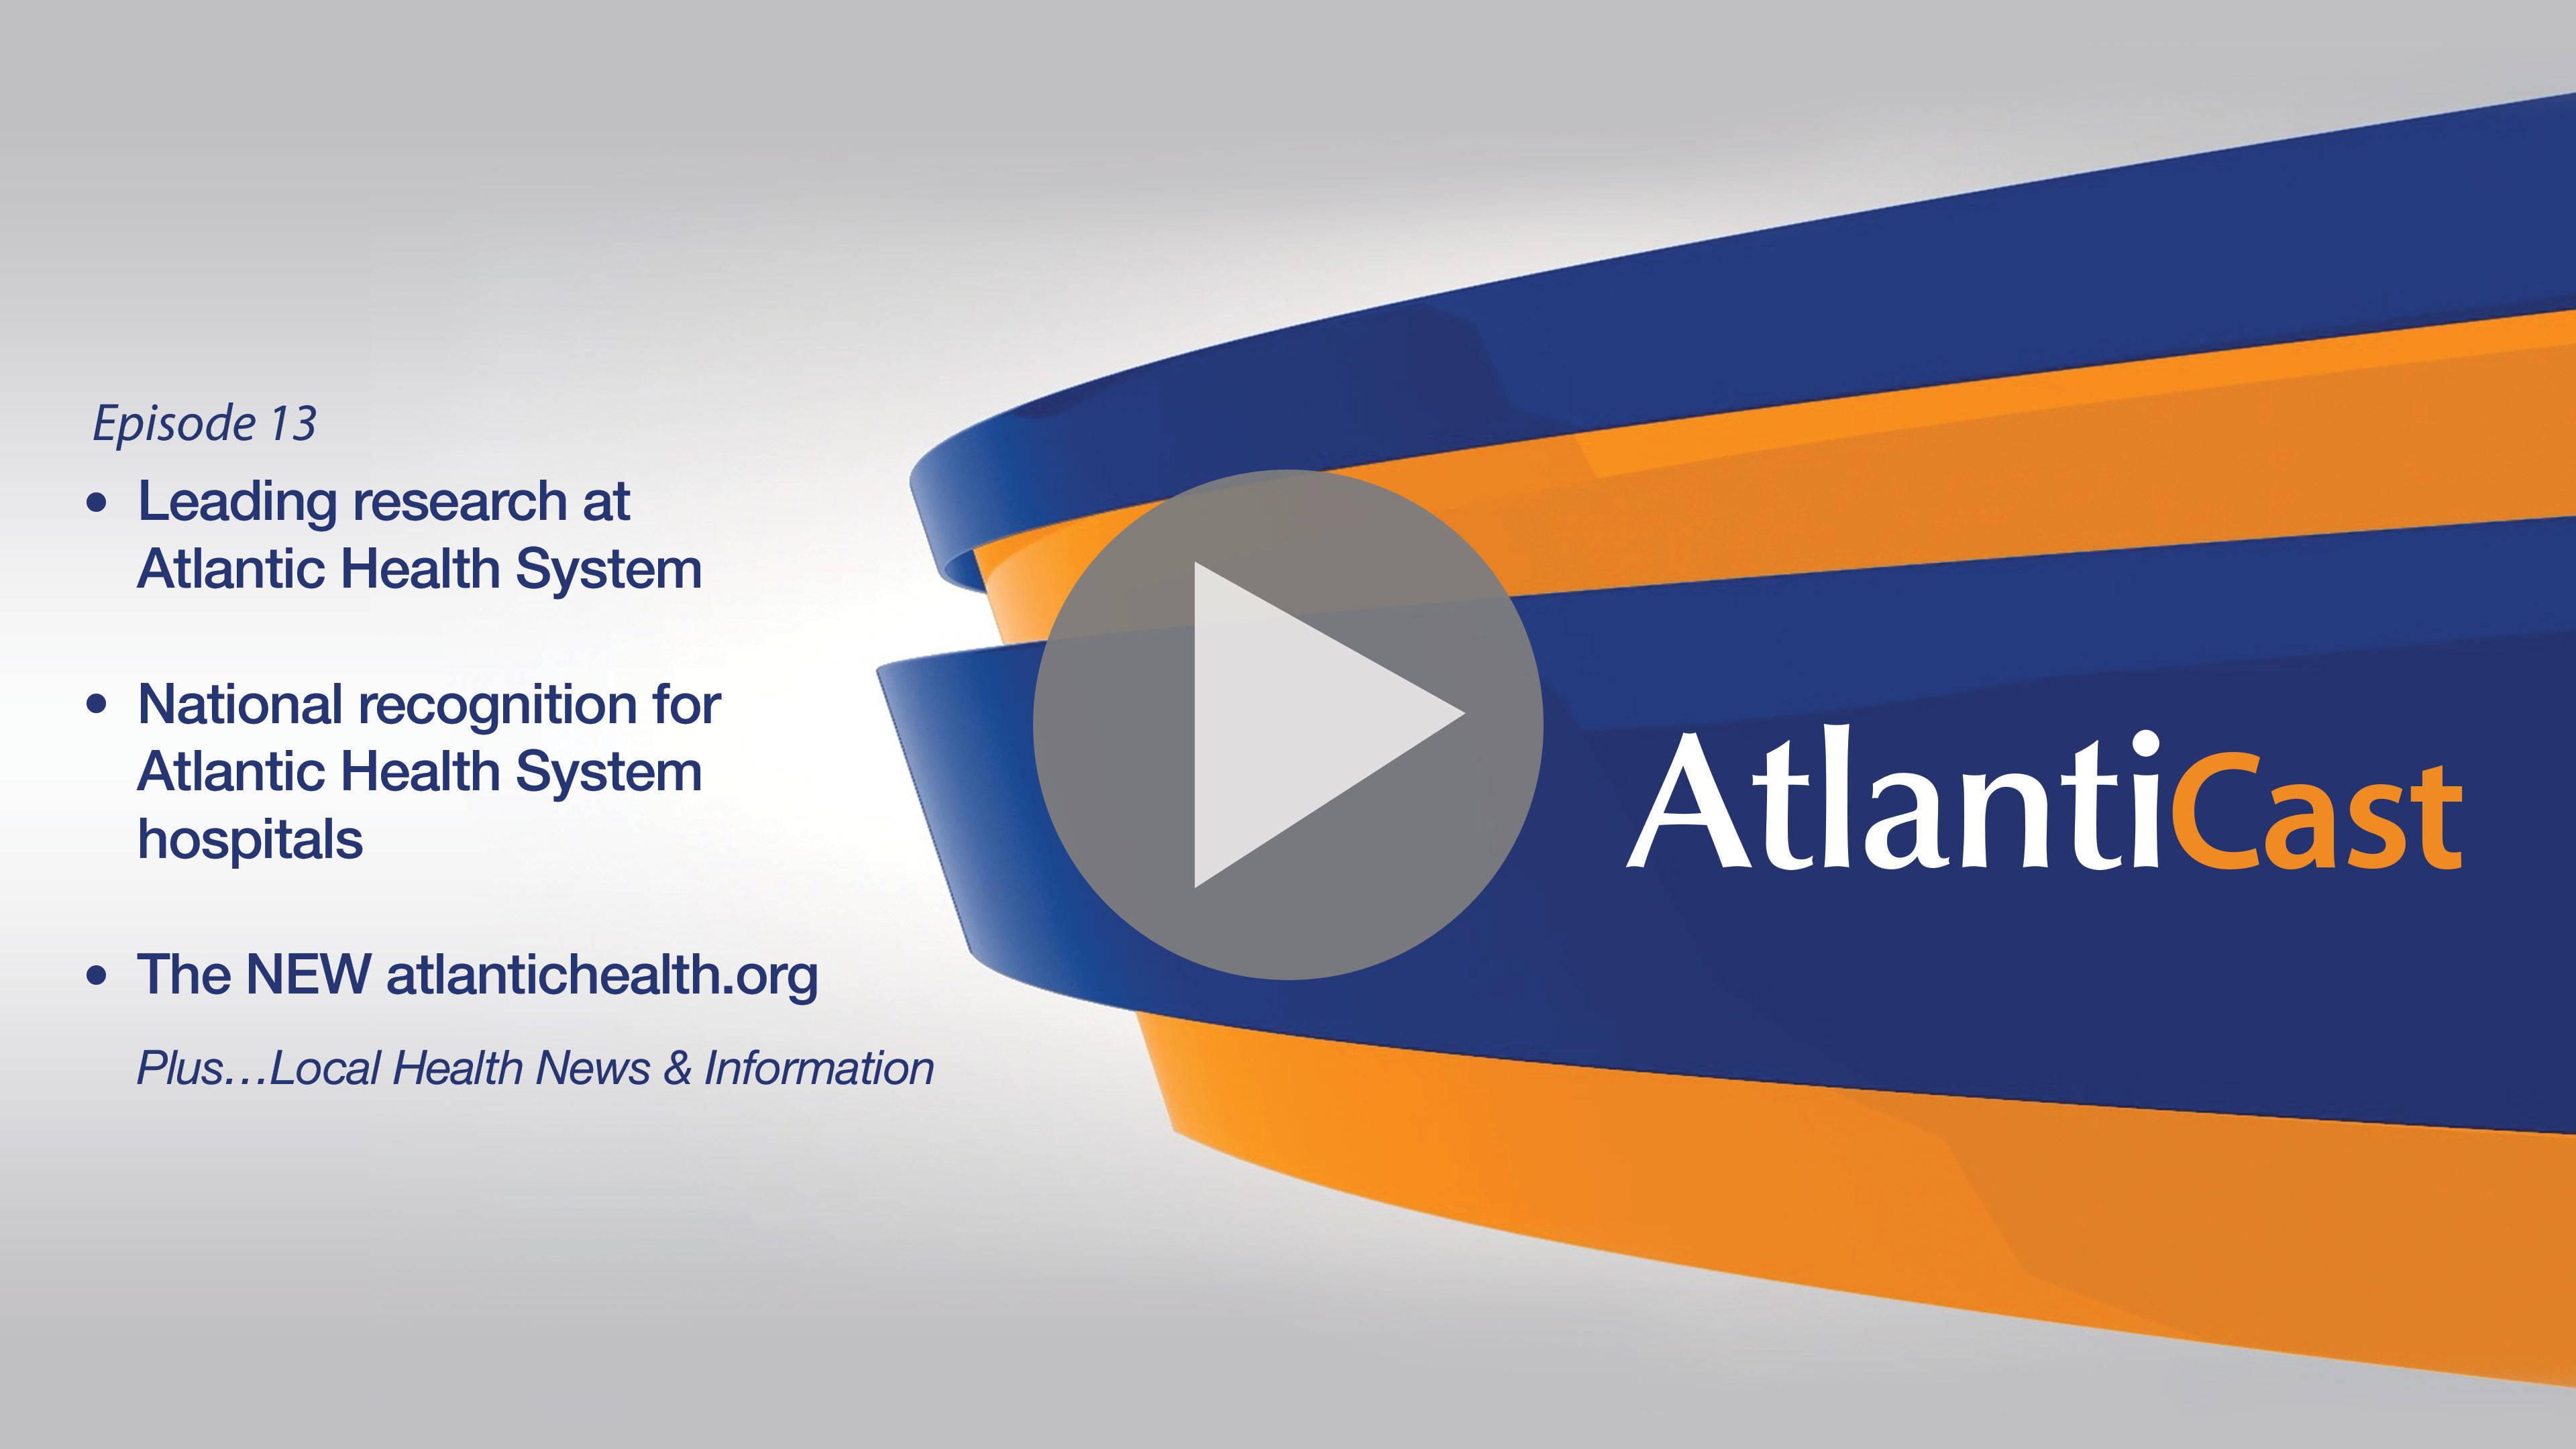 12f30da833cb75f3621c_AtlantiCast-Cover-Image-Ep13.jpg